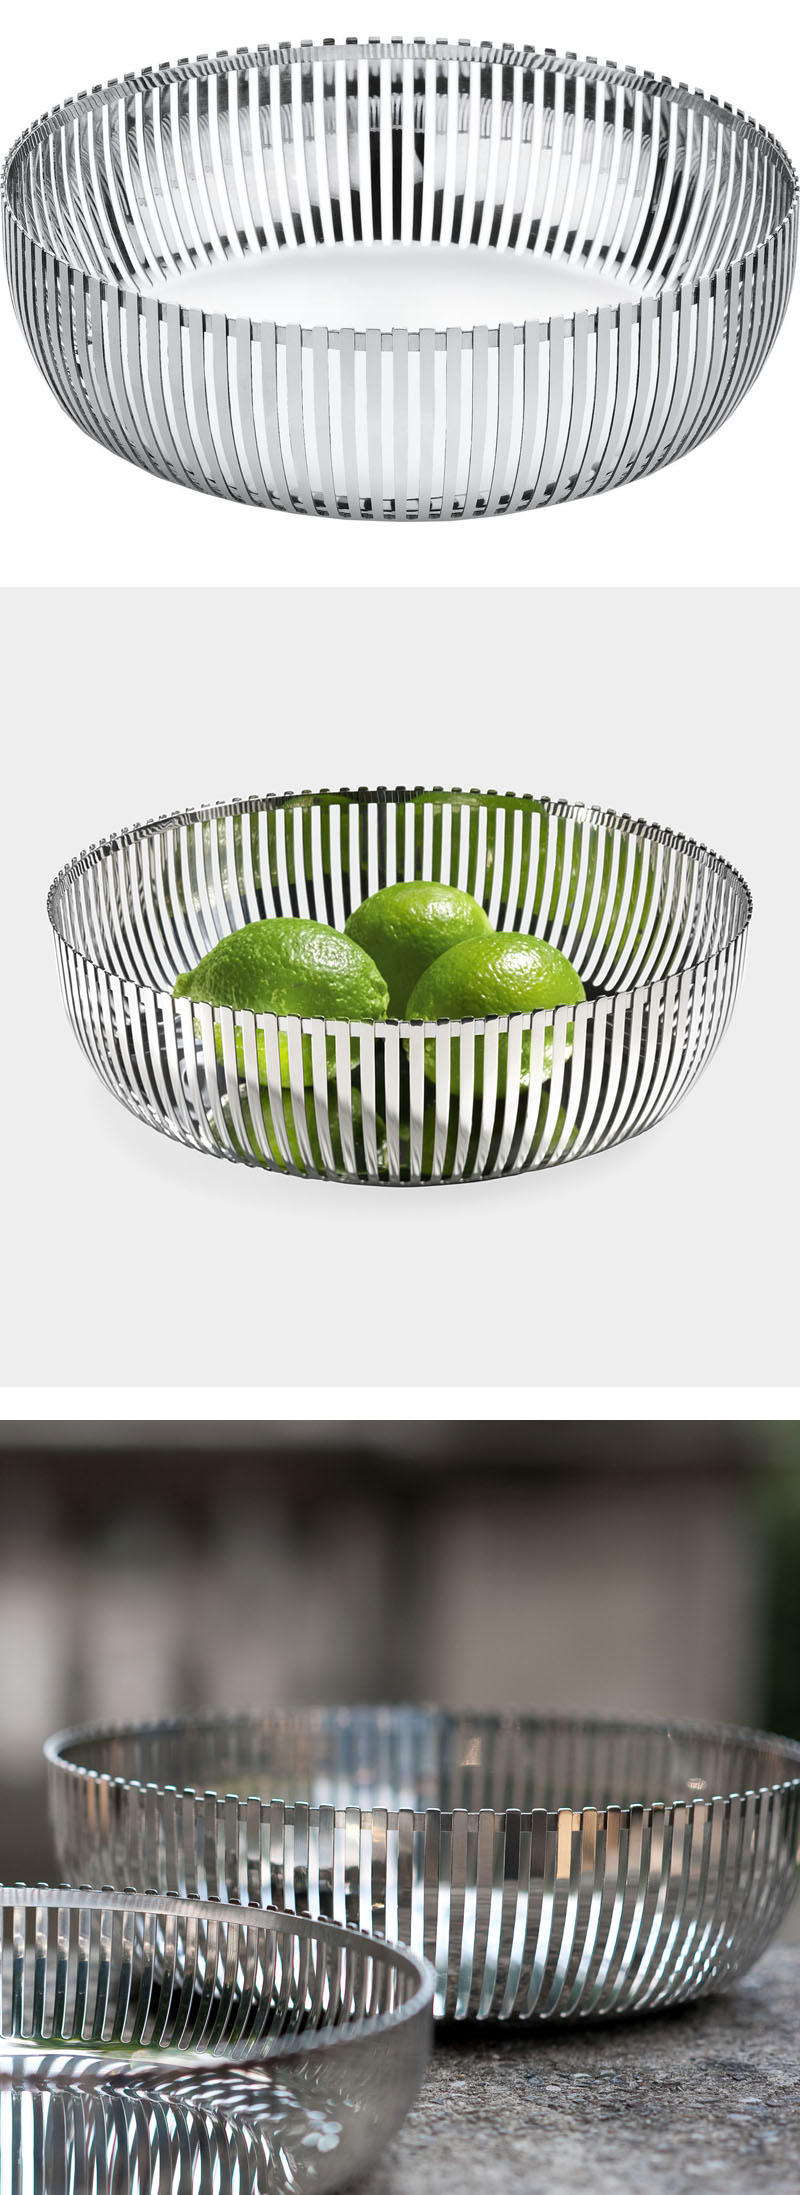 Alessi fruit basket by pierre charpin 9 inch dia pch02 23 nova68 modern design - Alessi fruit basket ...